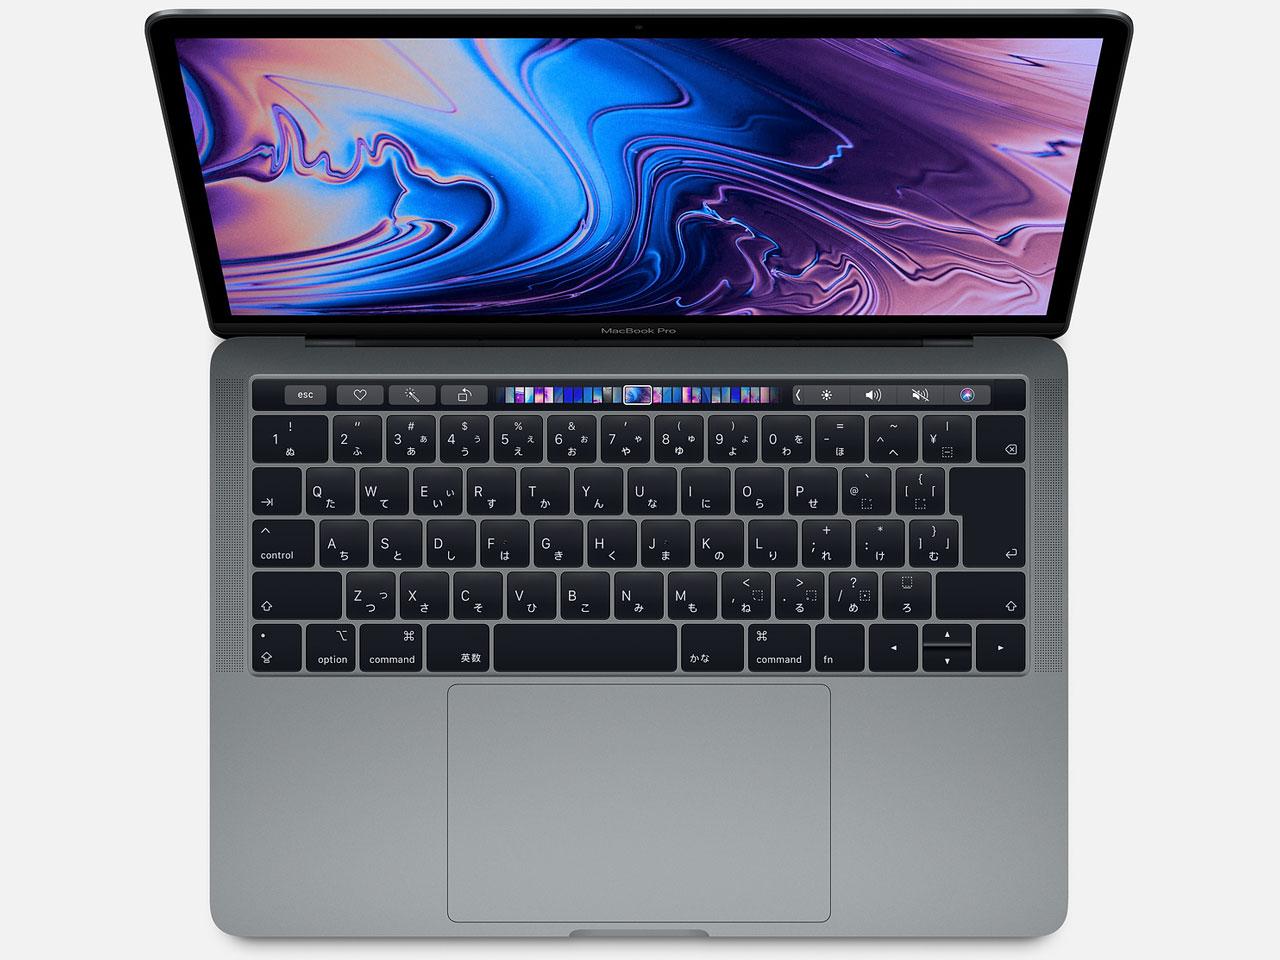 MacBook Pro Retinaディスプレイ 2300/13.3 MR9Q2J/A [スペースグレイ] の製品画像